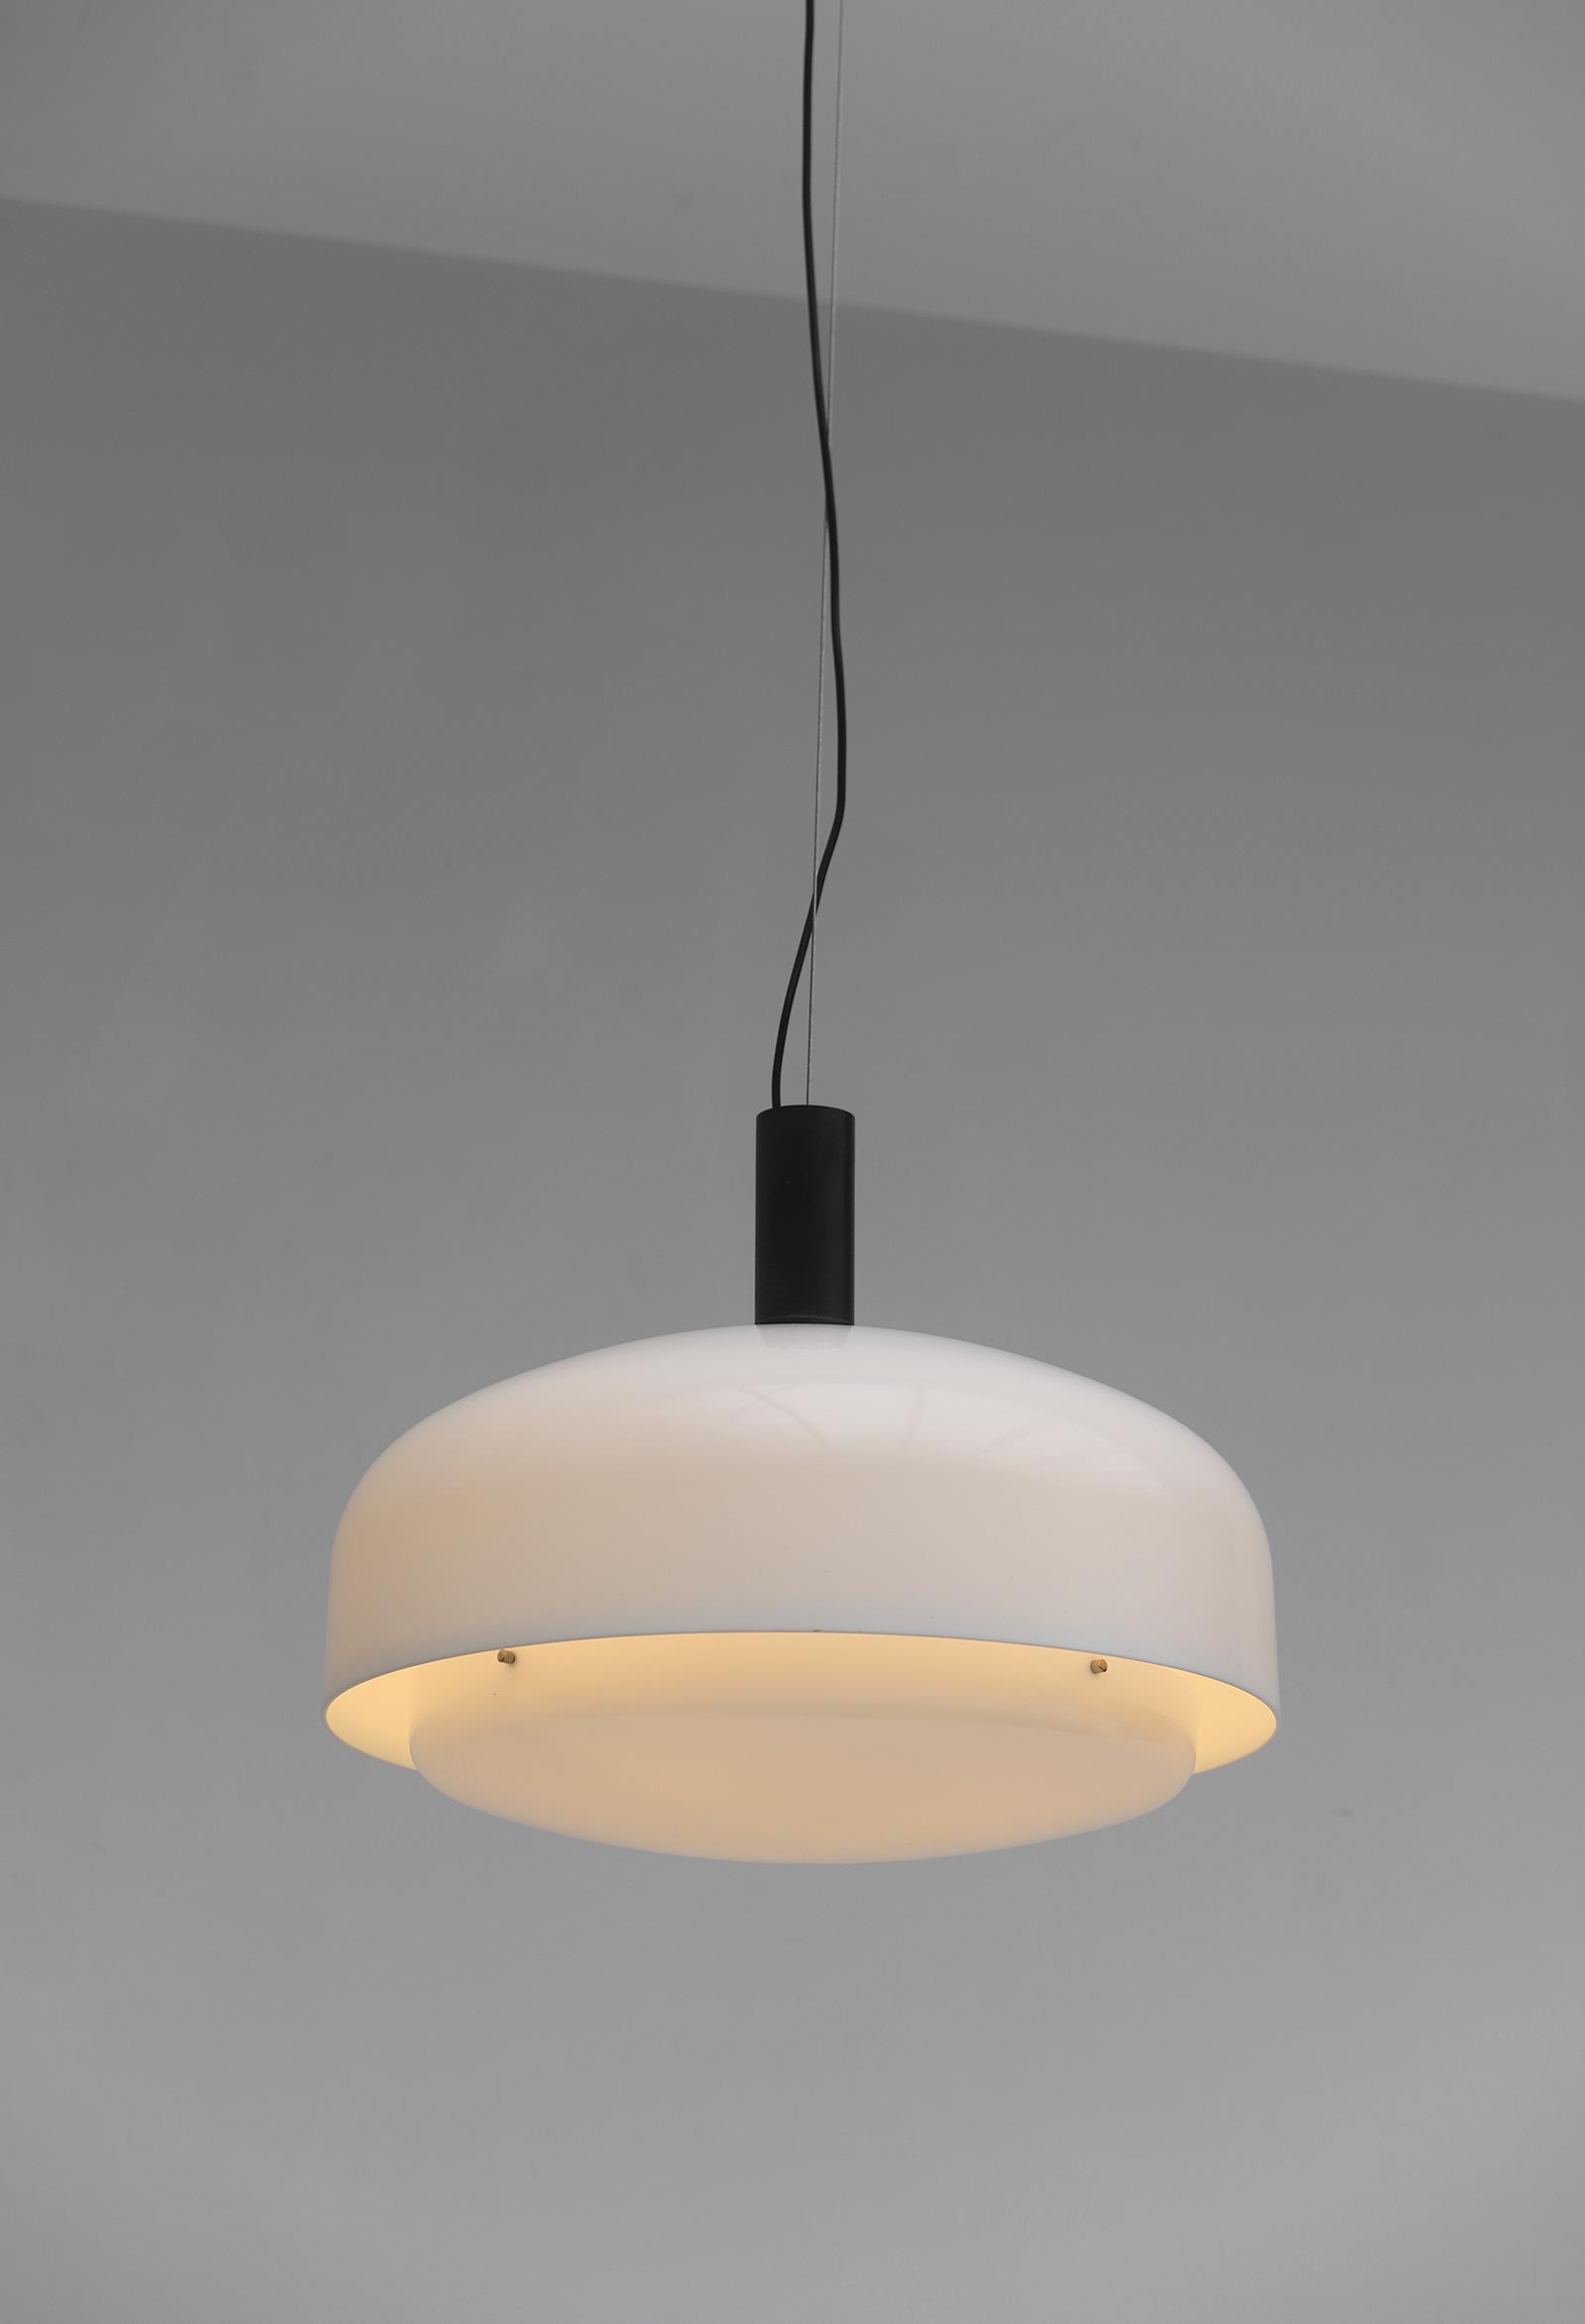 Eugenio Gentile Kartell kd62 Pendant Lamp image 4